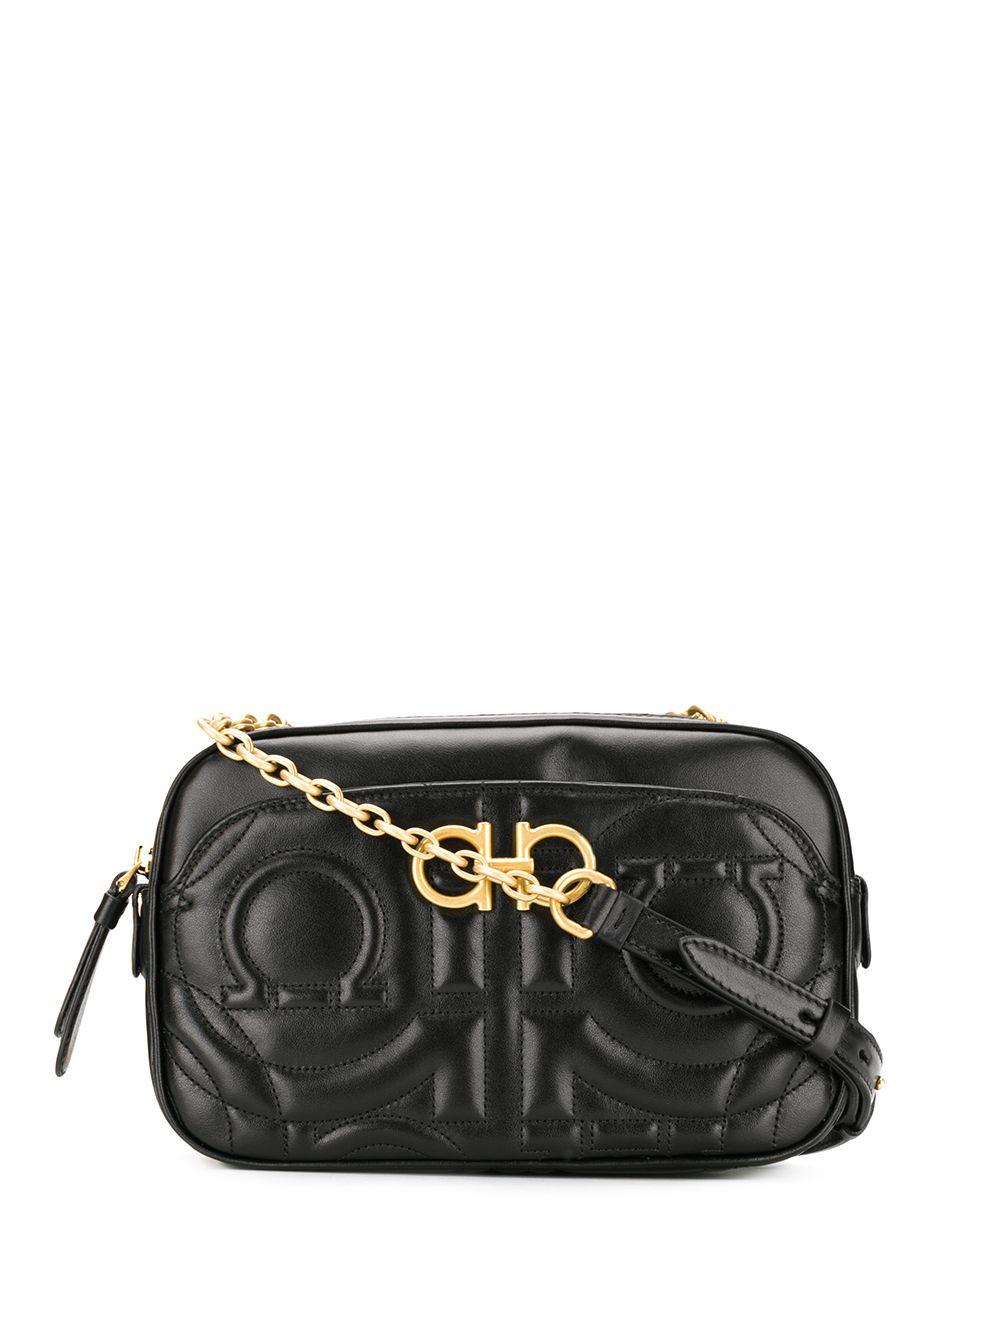 Gancino Leather Crossbody Bag